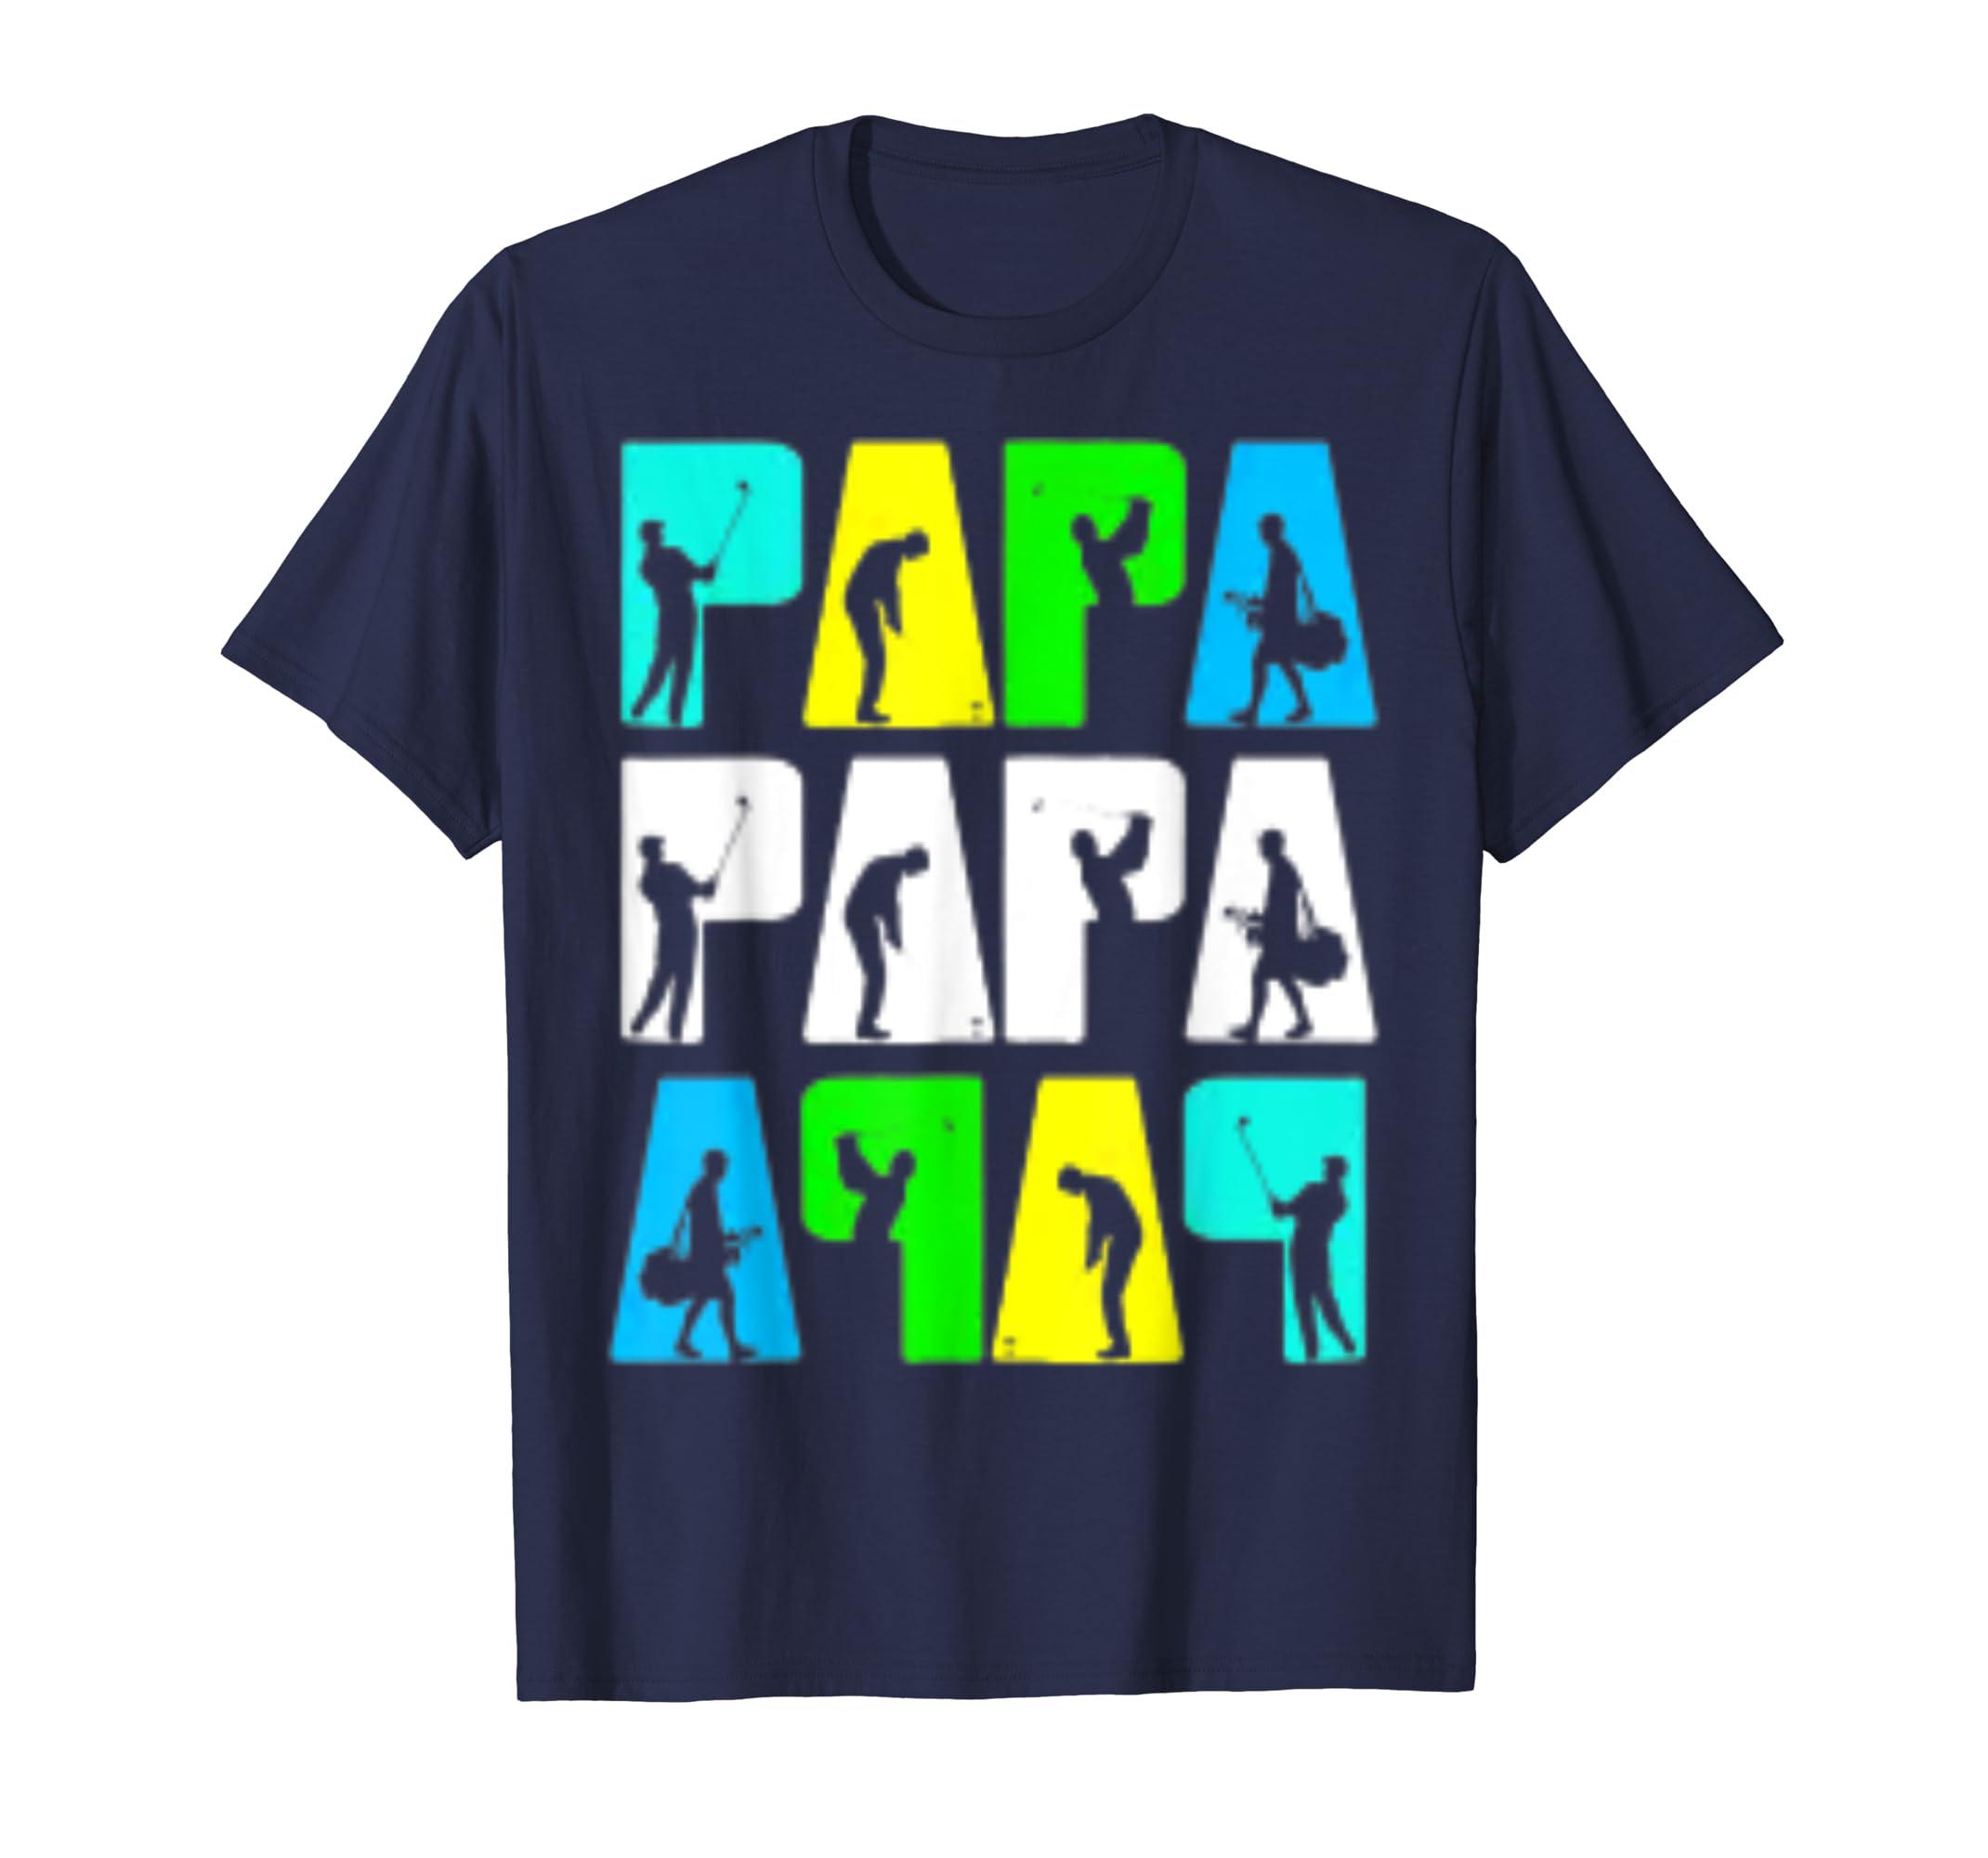 d871f5da Amazon.com: Retro Golfing Papa Tee Shirt. Golf Gifts For Fathers Day:  Clothing